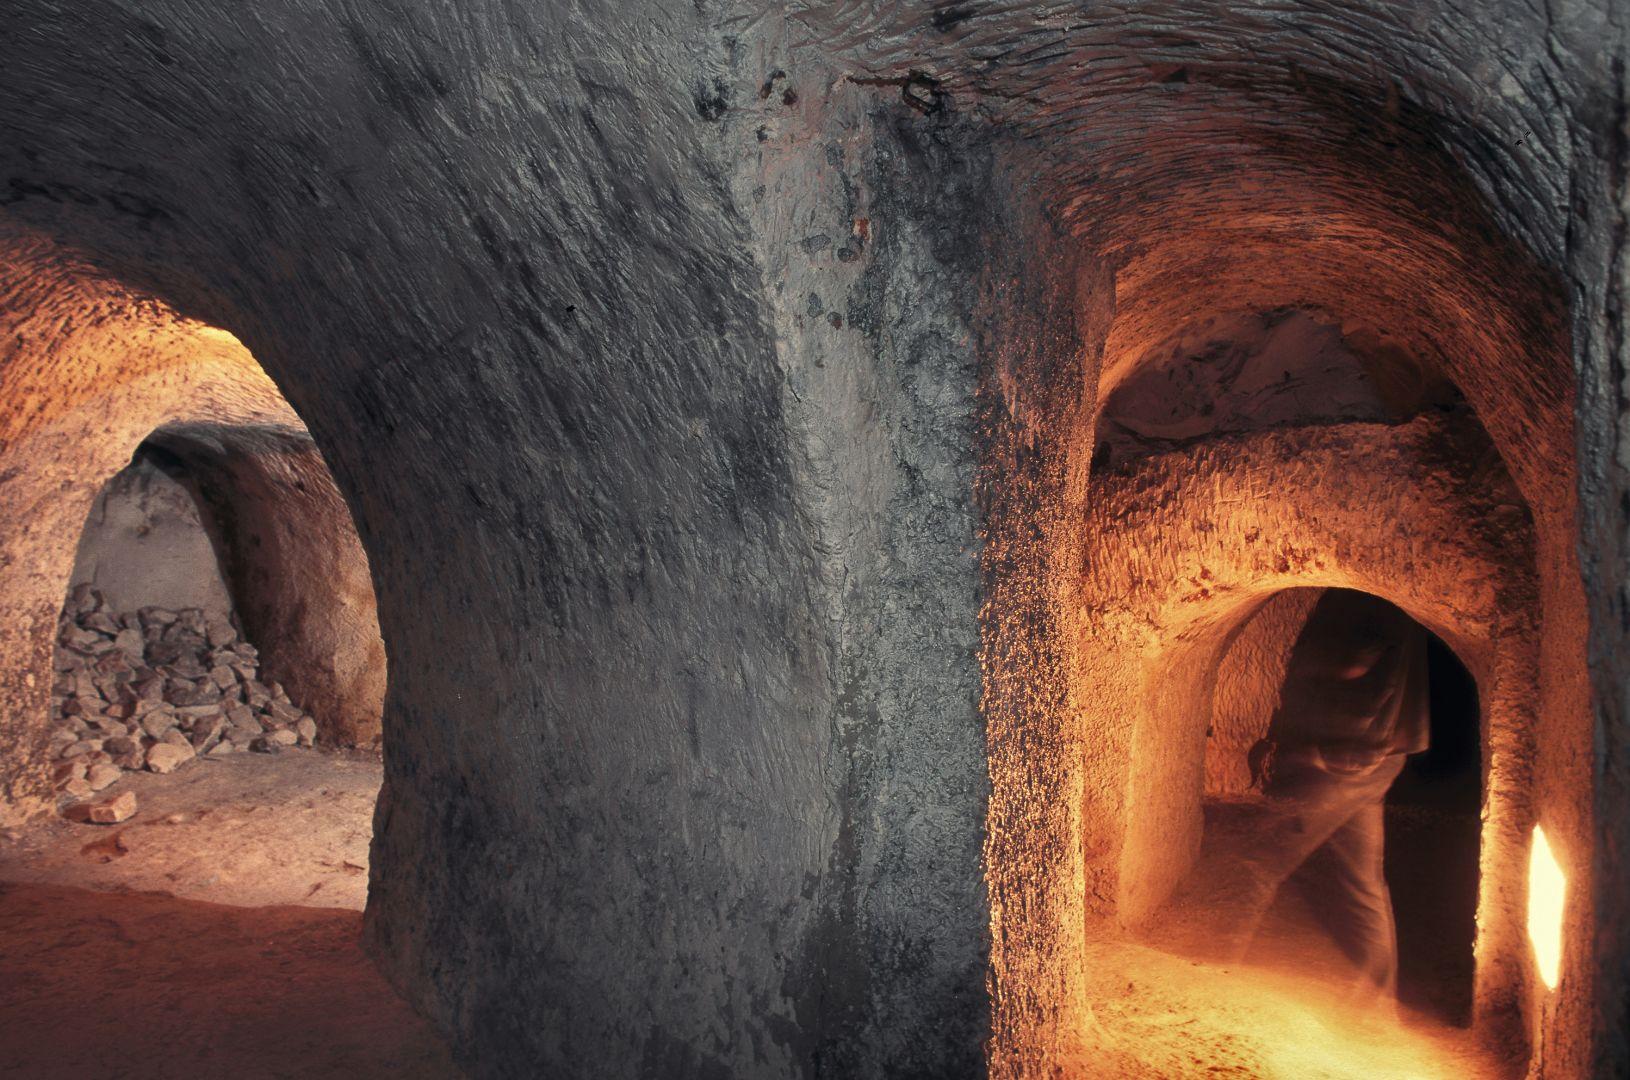 Kredowe tunele